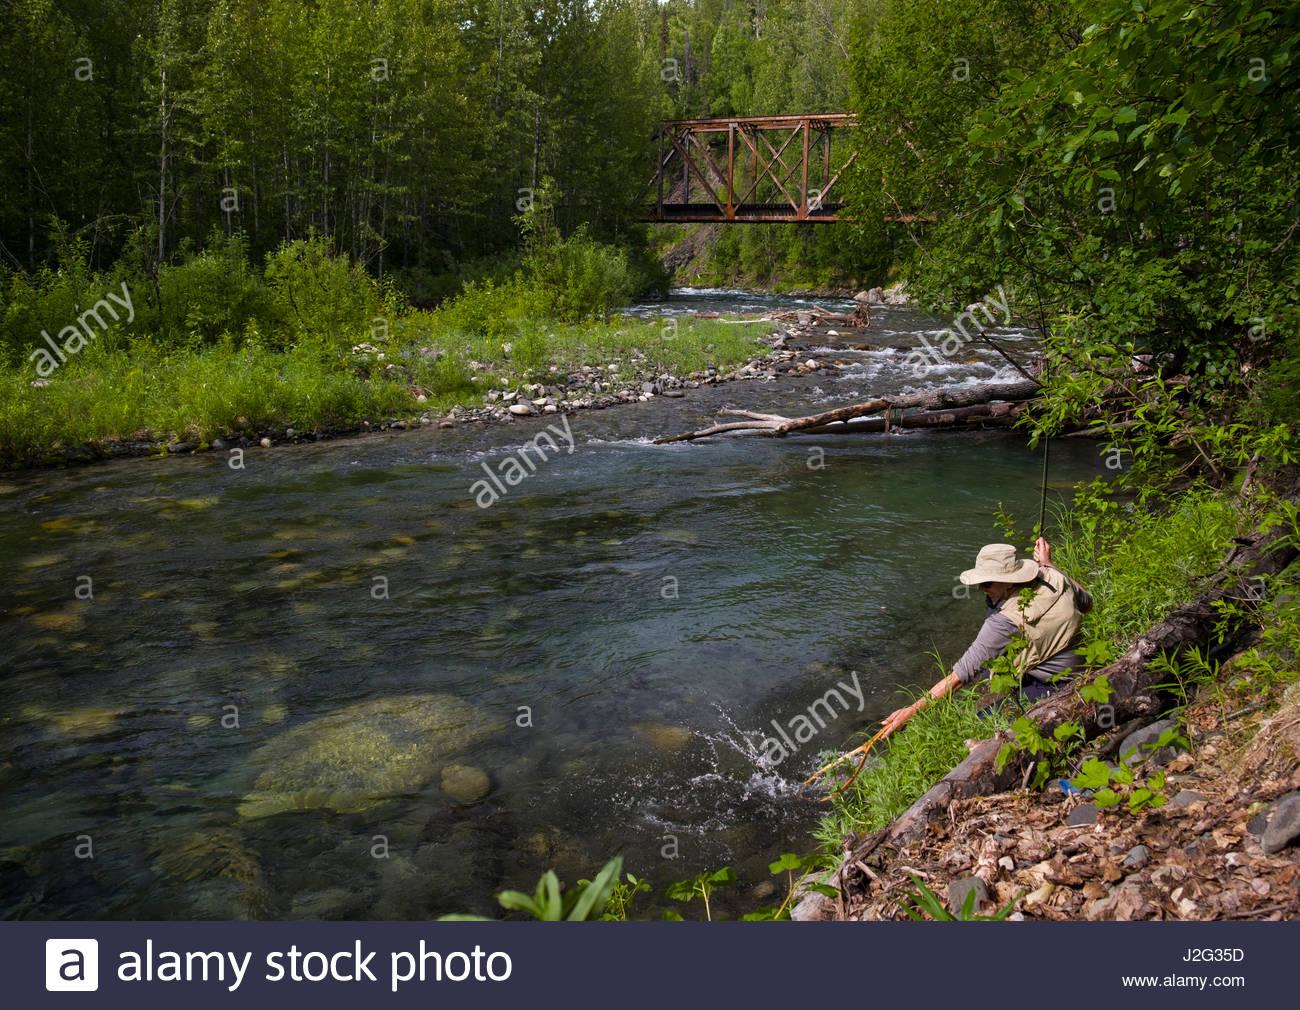 Alaska matanuska susitna county talkeetna - Man Fly Fishing The Indian River Talkeetna Mountains Matanuska Susitna Alaska